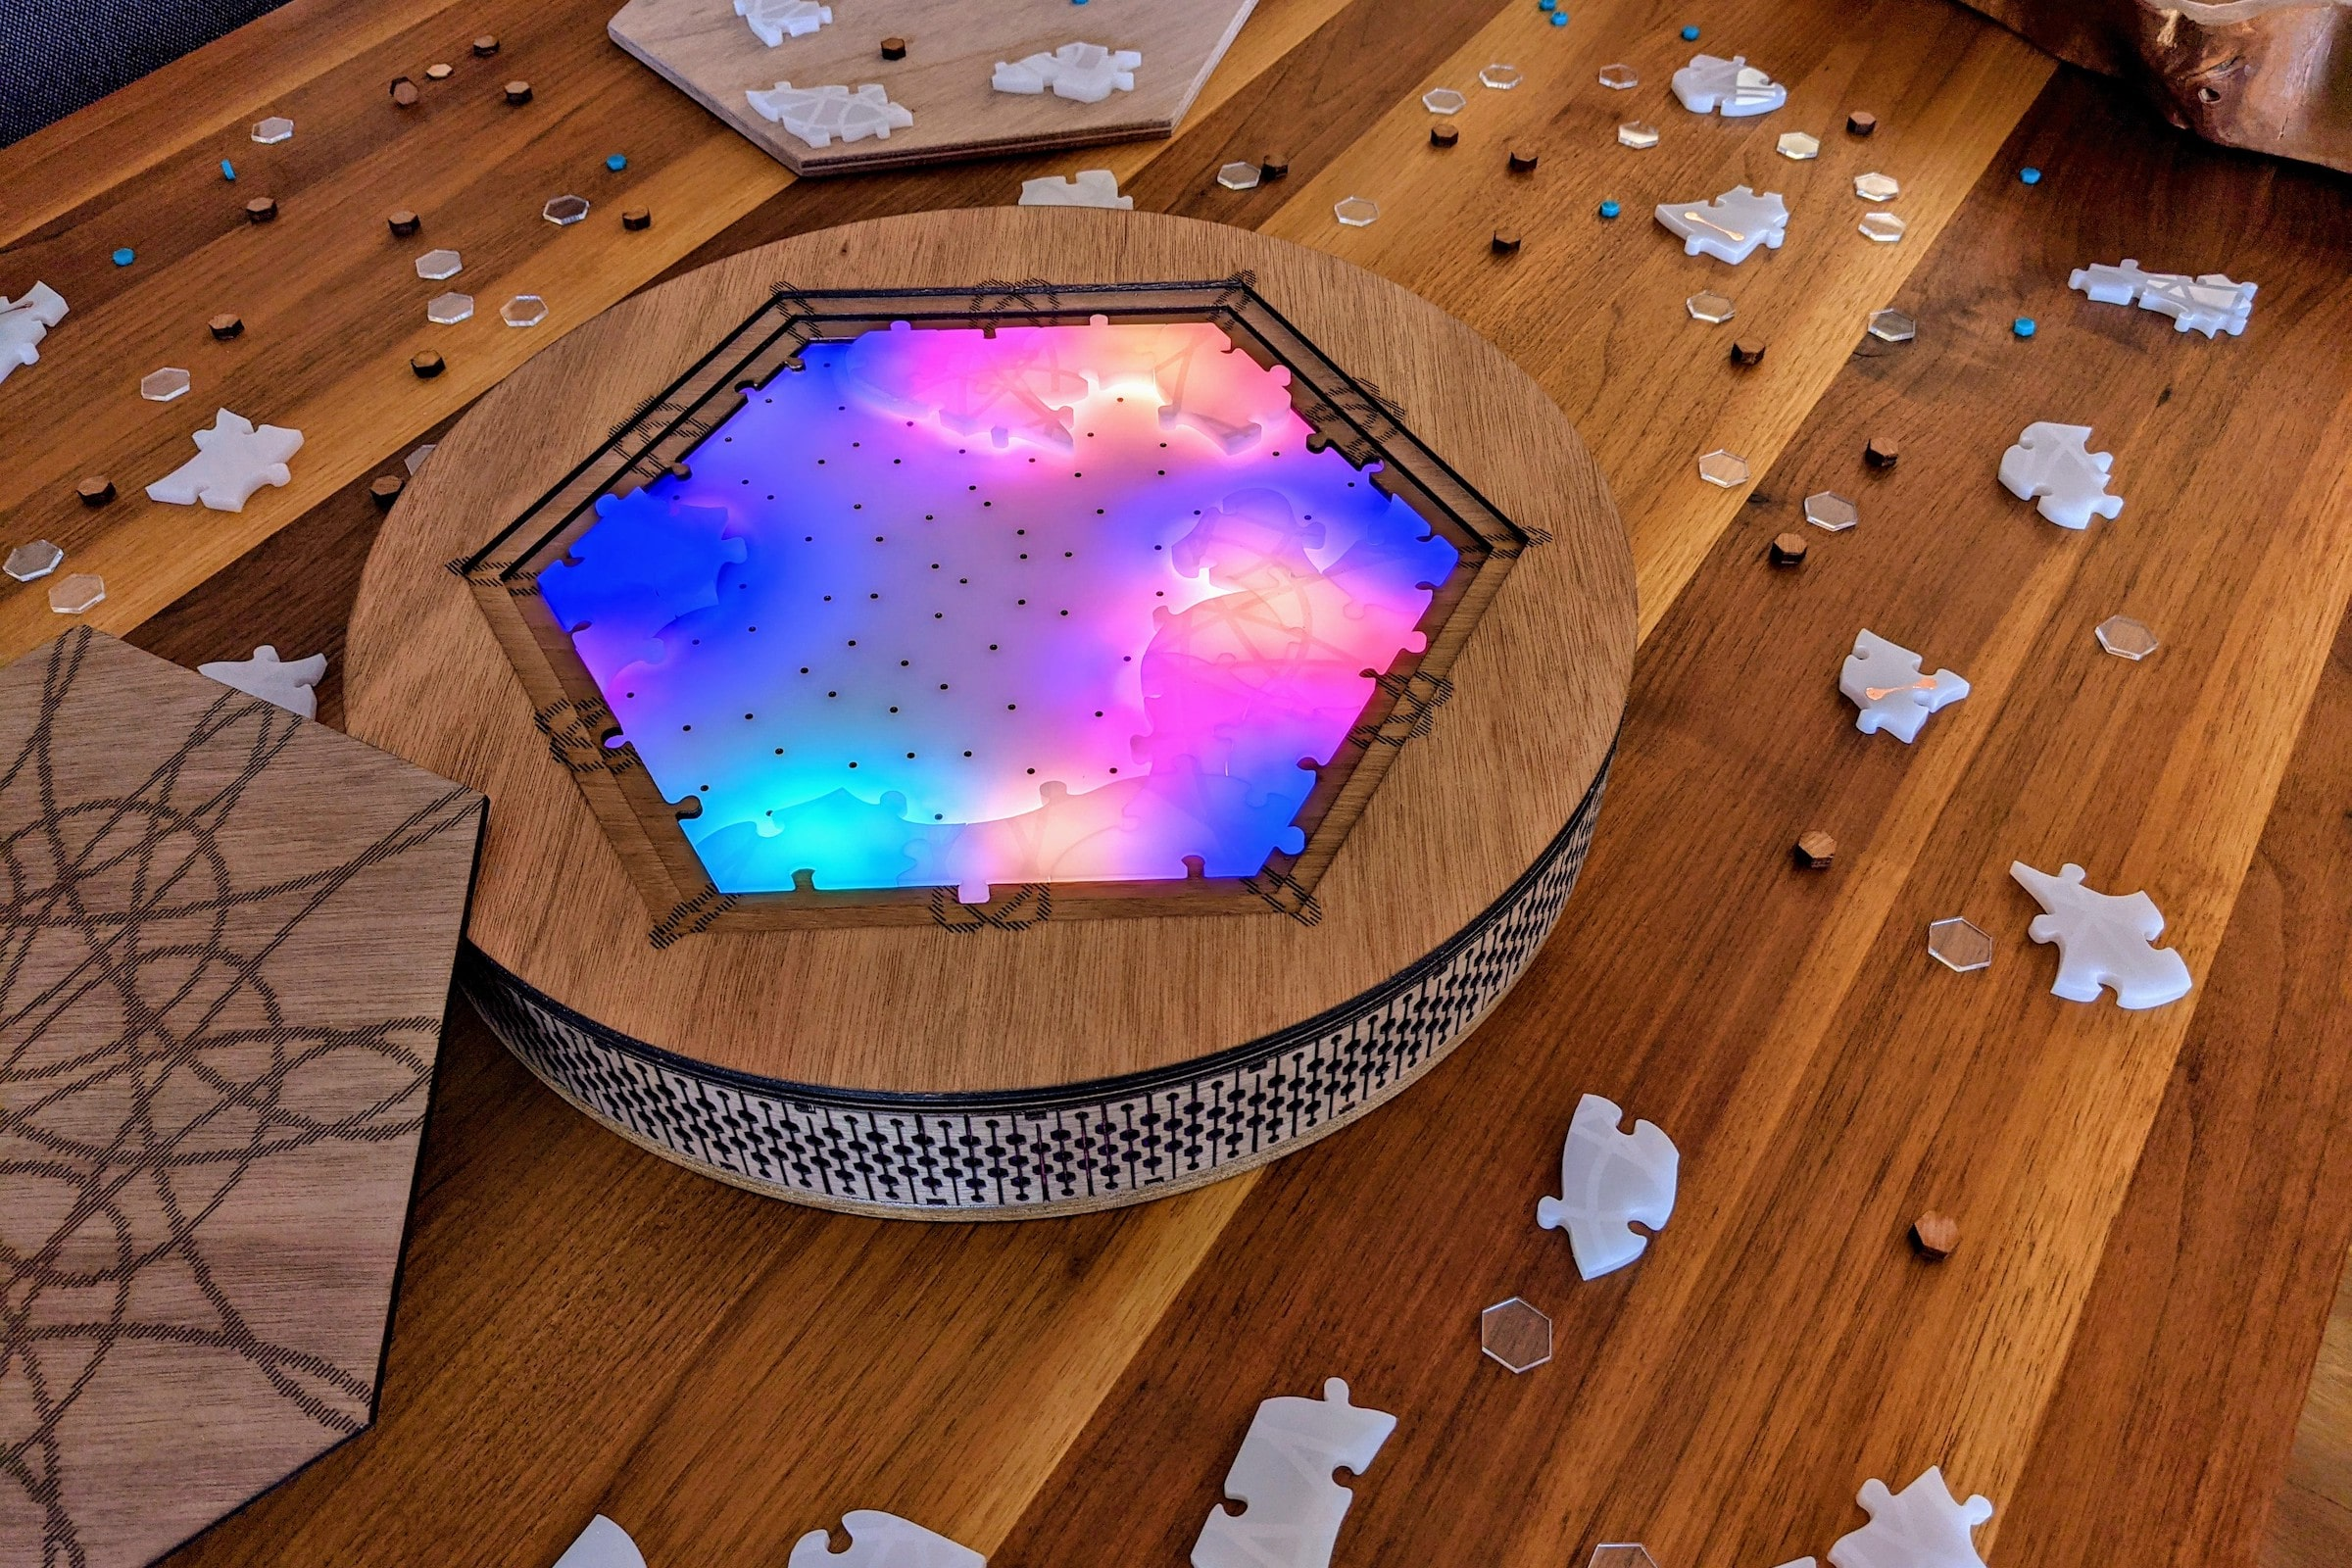 My final project, NOVA, a jigsaw puzzle with light